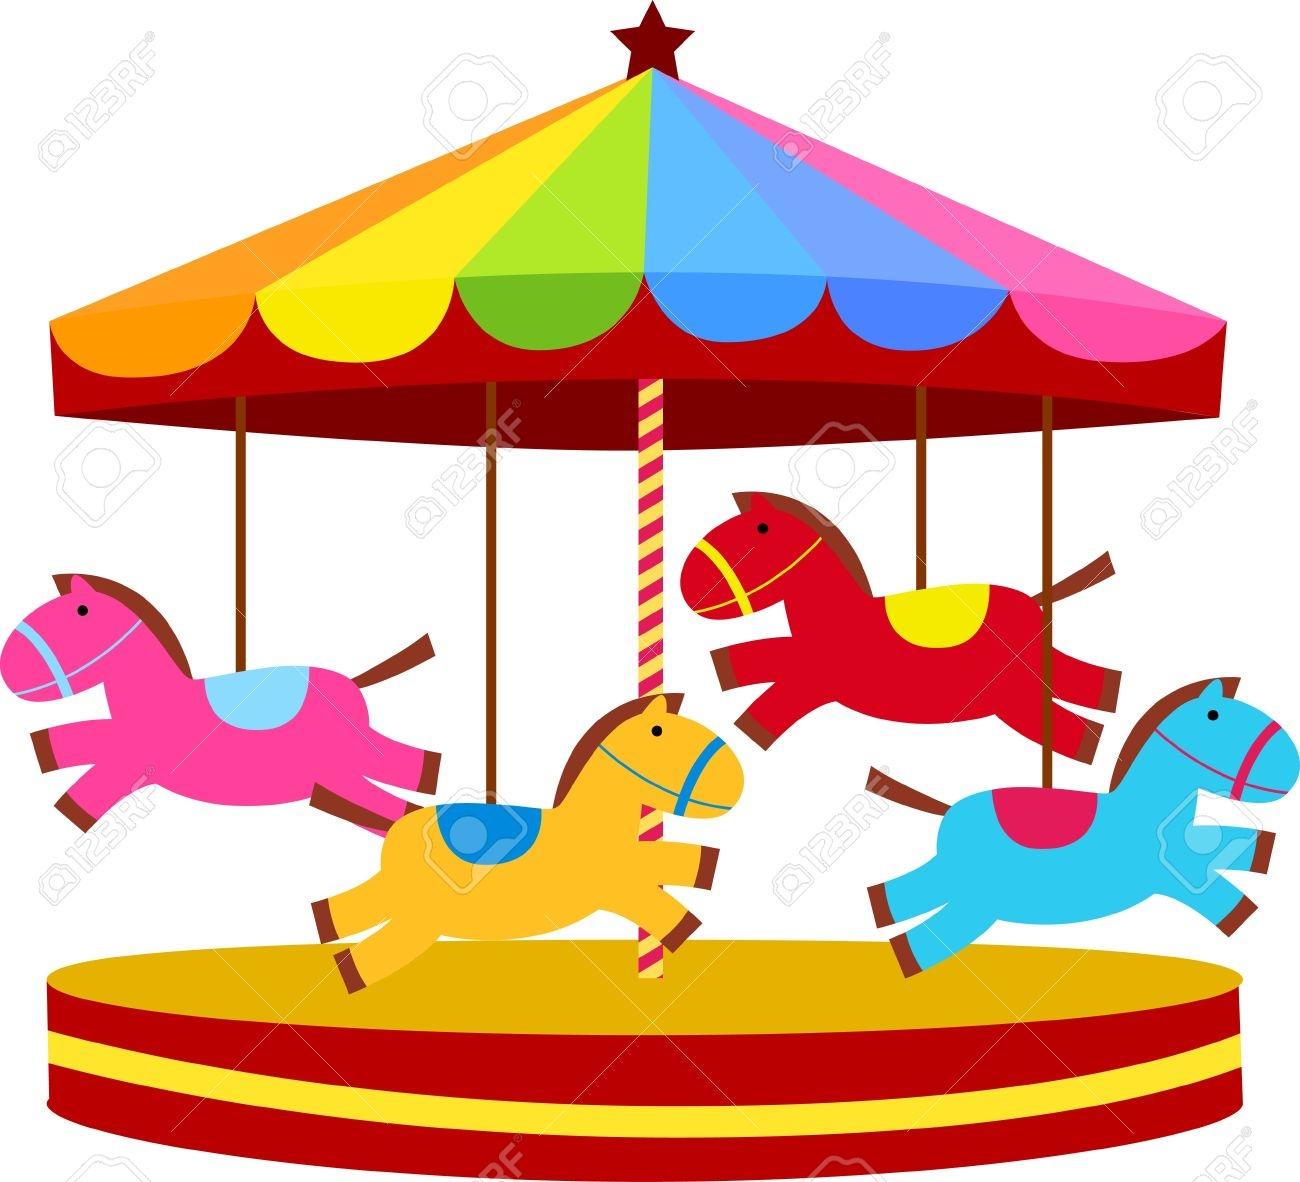 carousel clipart simple